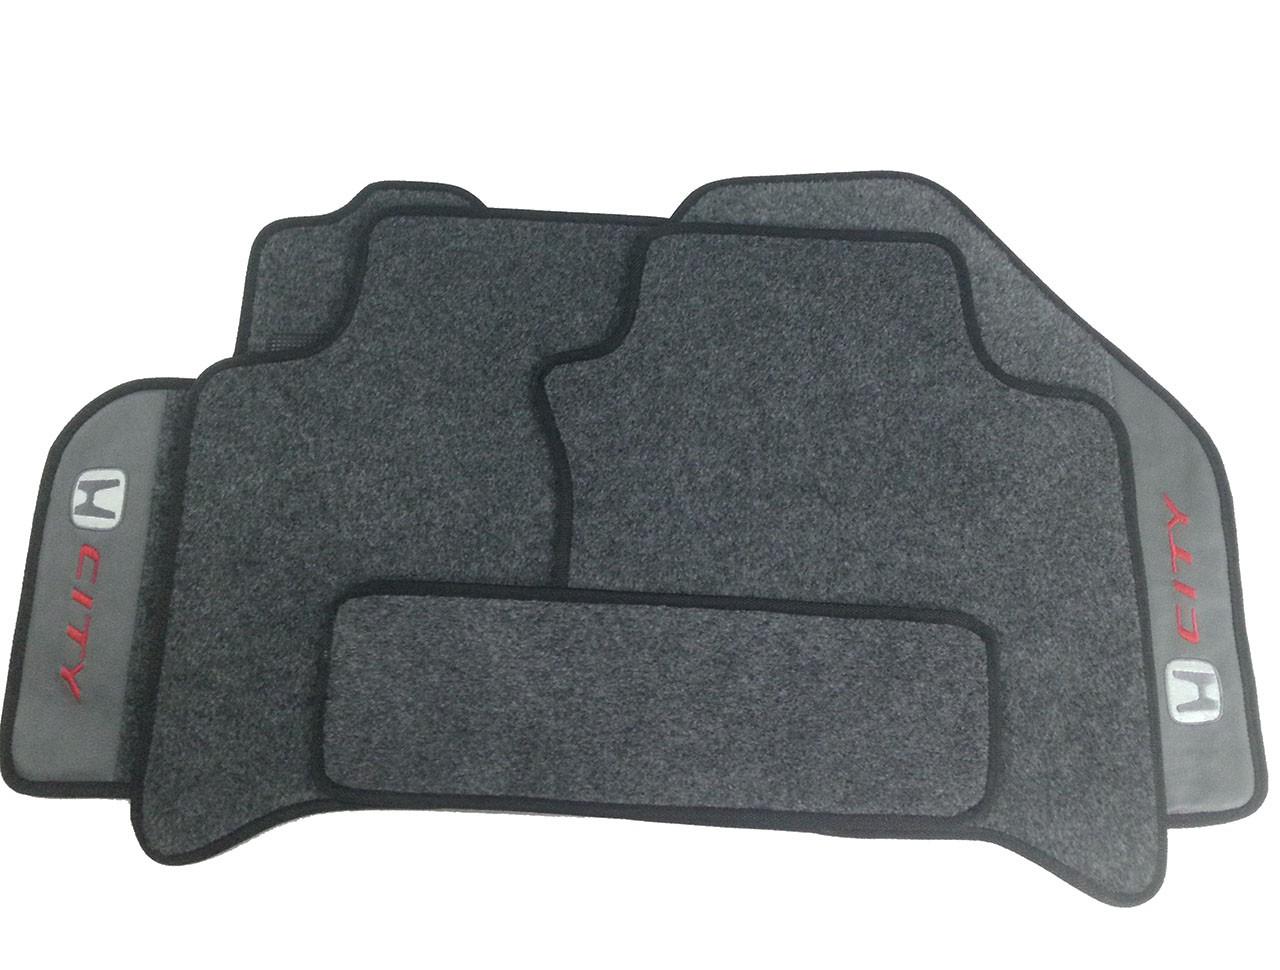 Jogo de Tapetes Honda City Carpete Premium Base Pinada